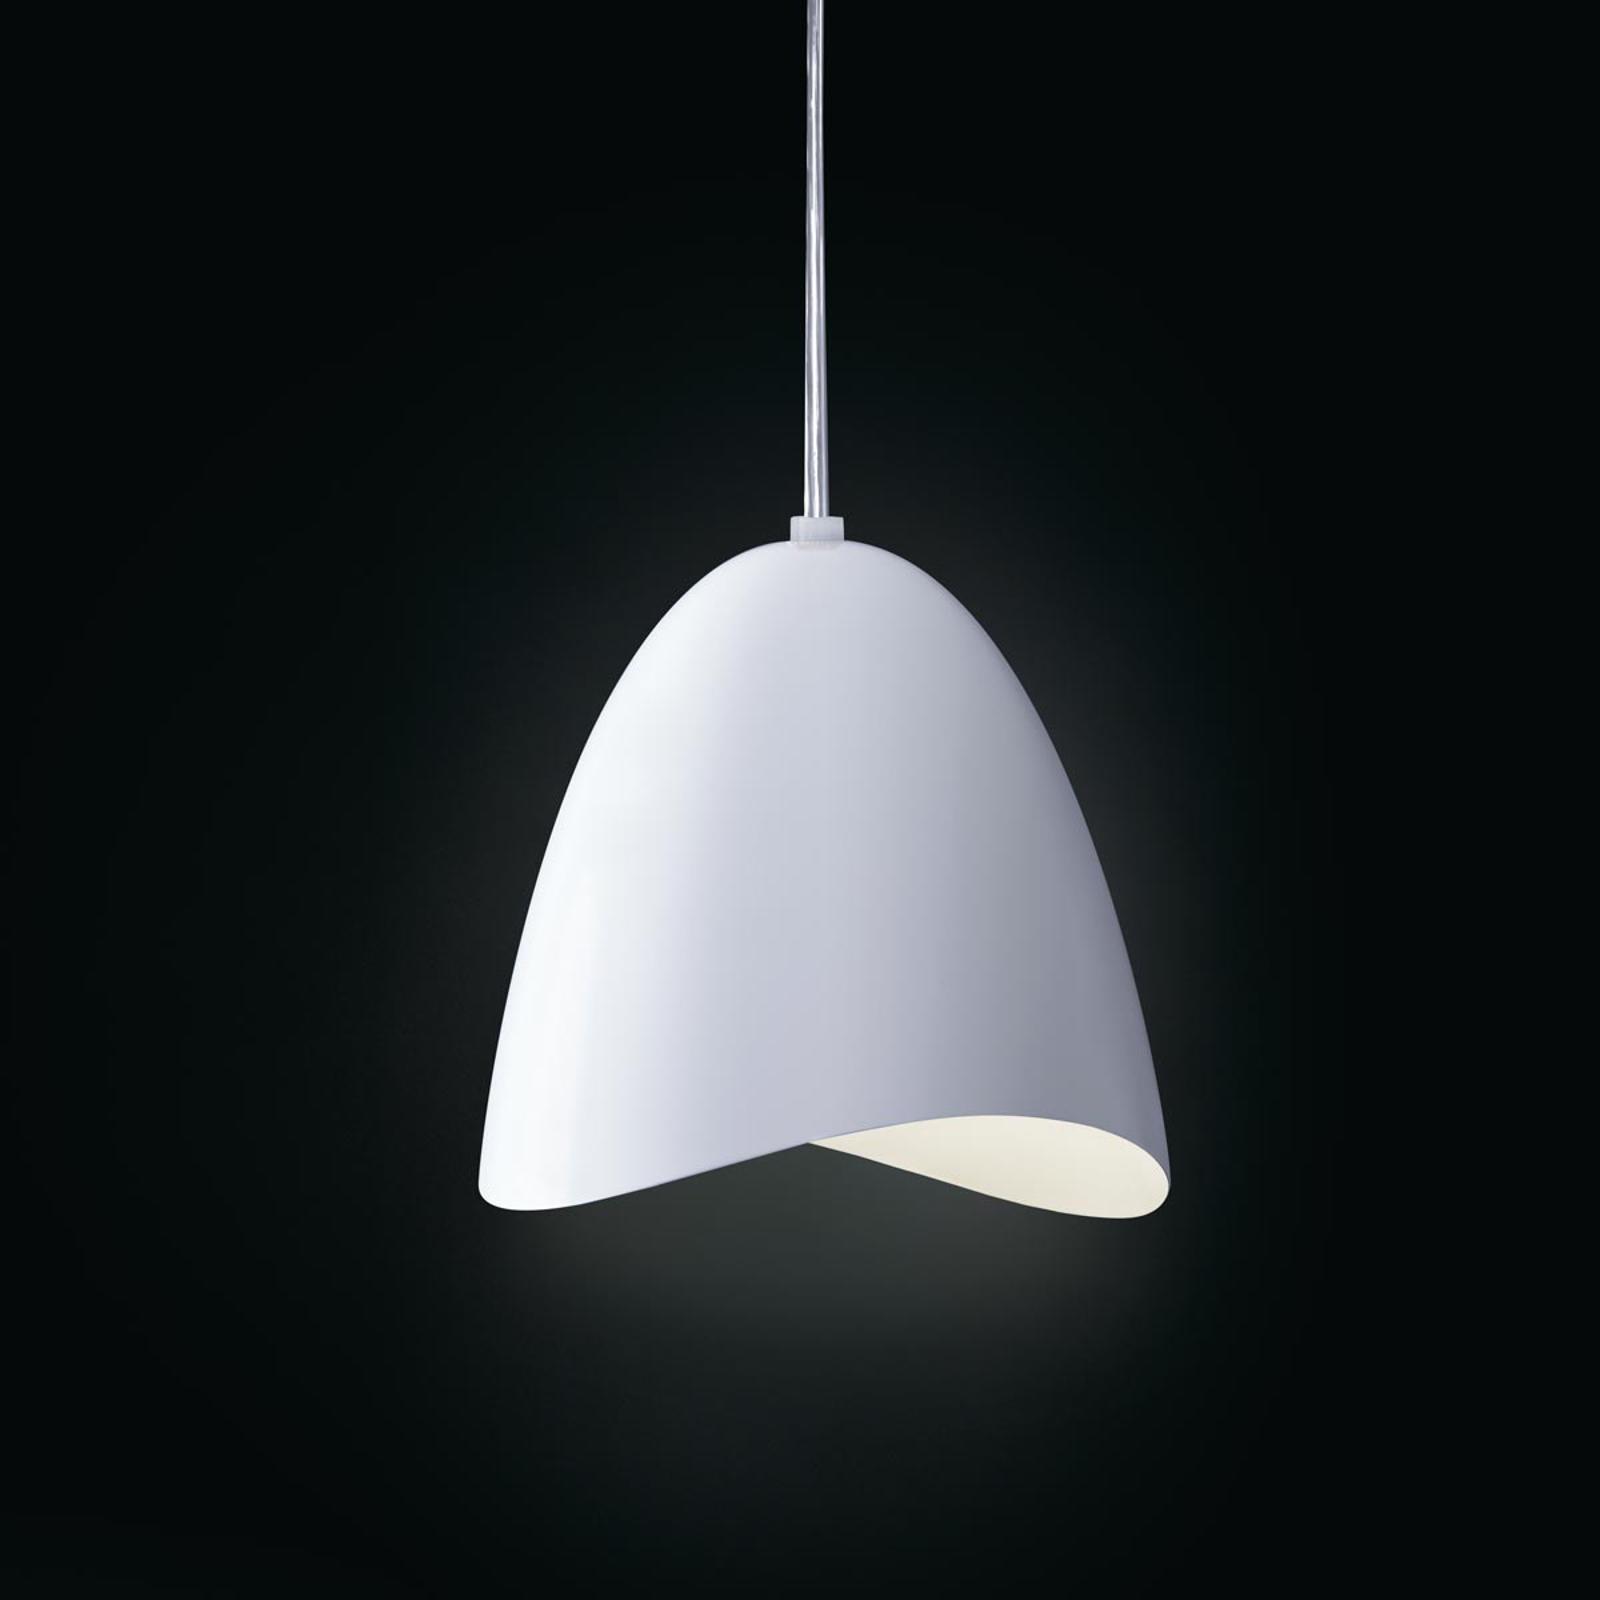 Lampada a sospensione LED bianco lucido Mirage